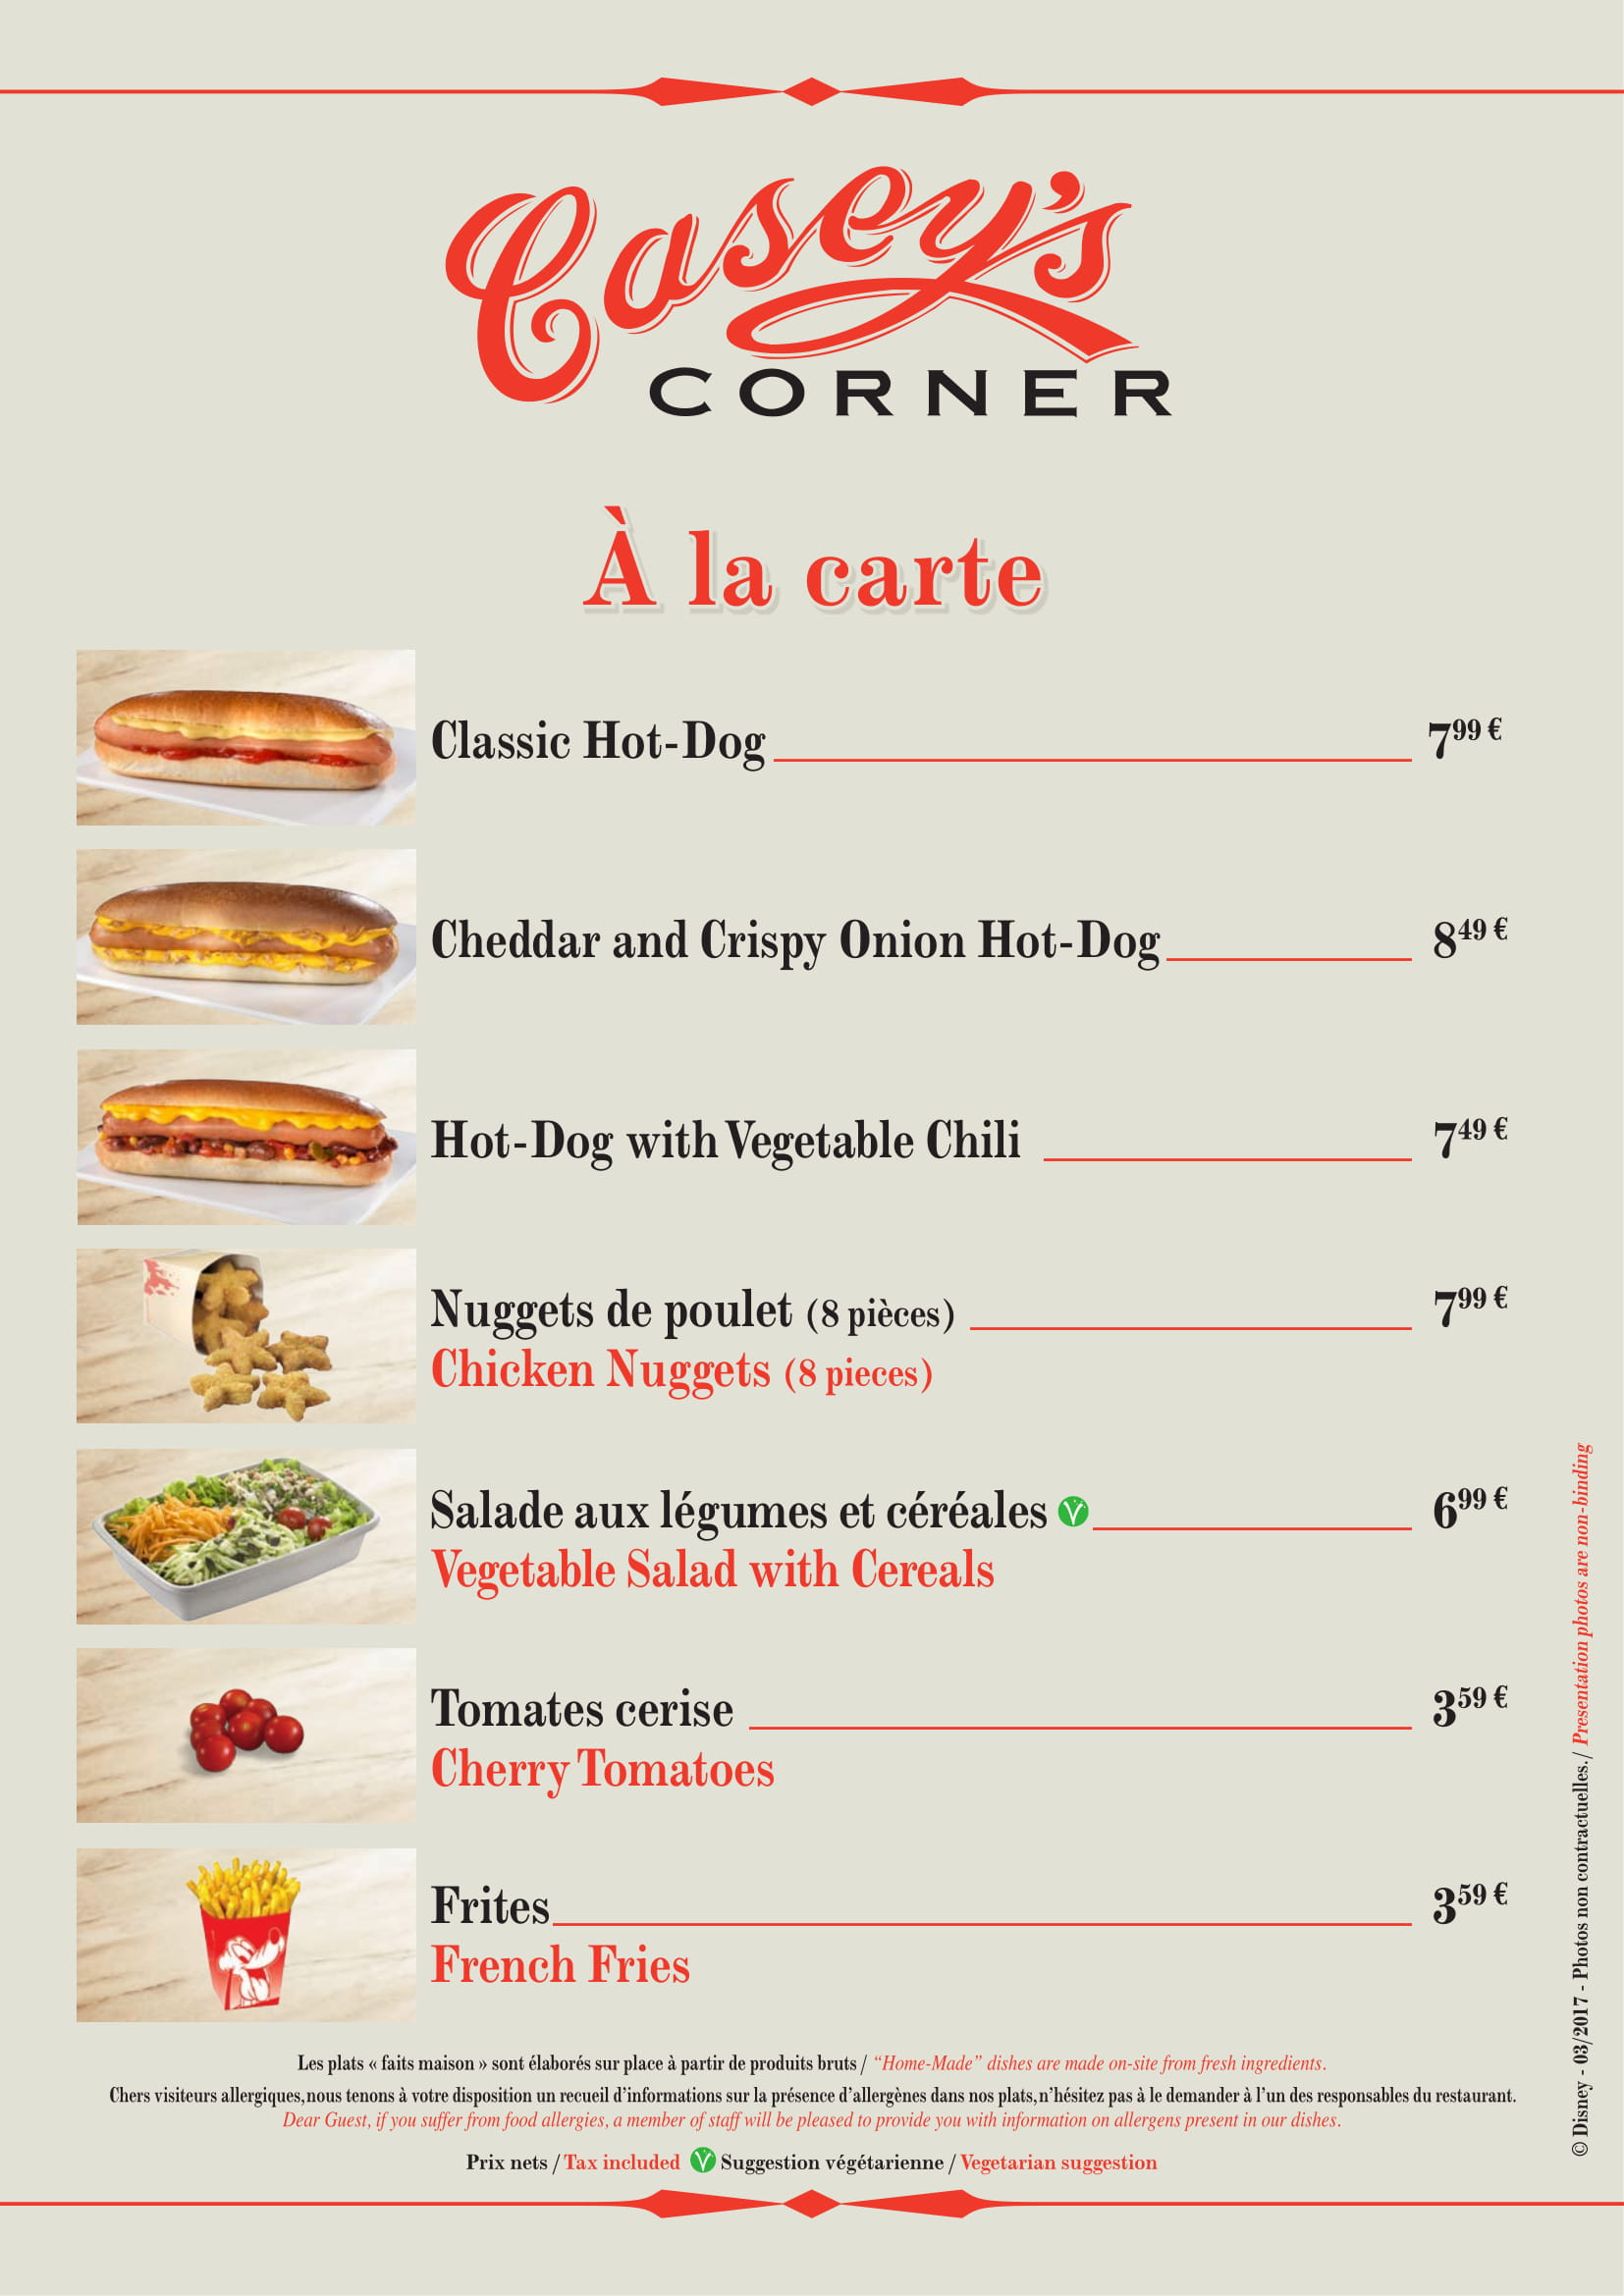 Casey's Corner menu in Disneyland Paris - 1